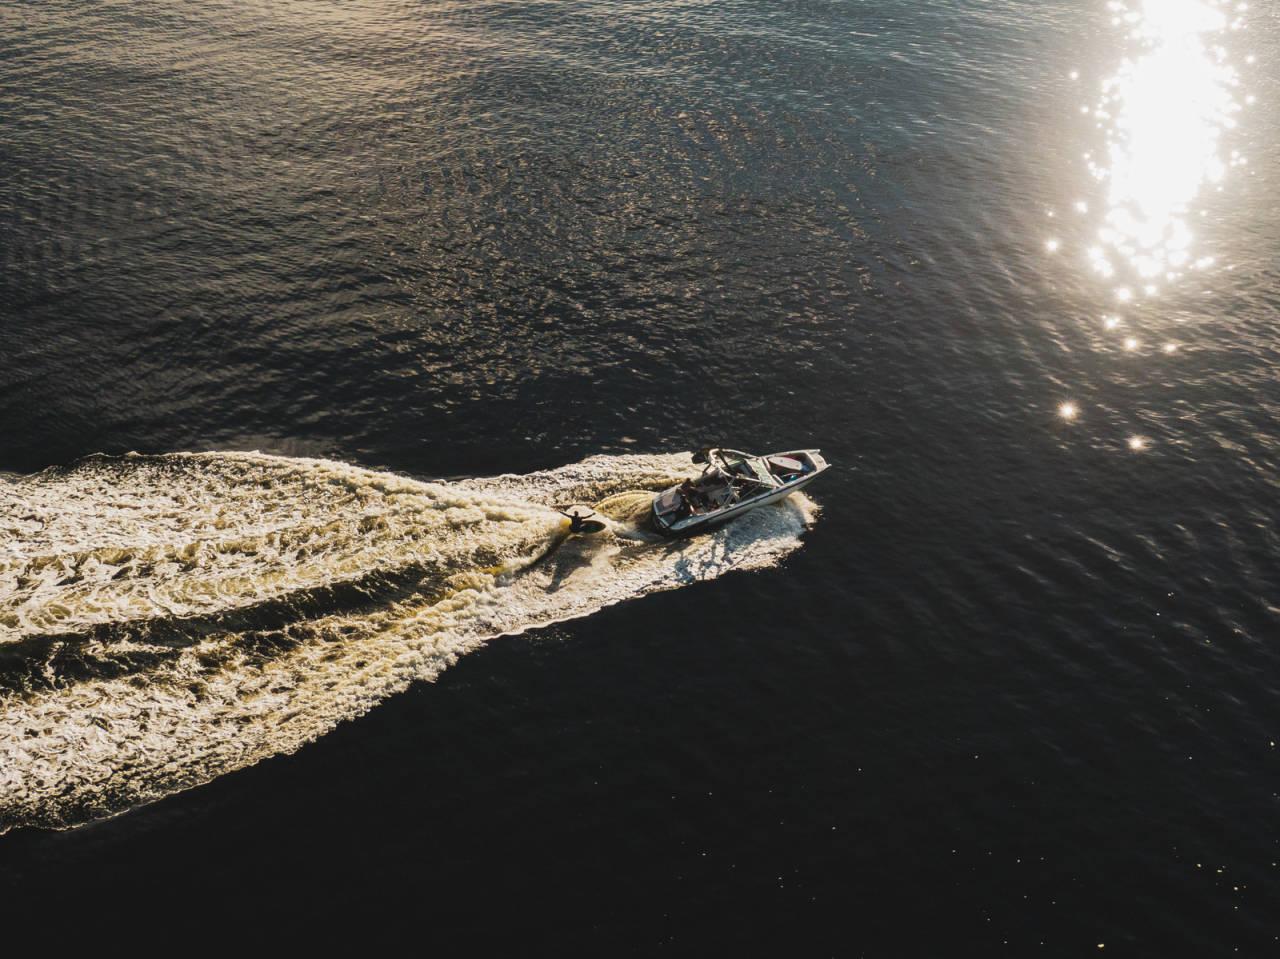 Wakesurf drone